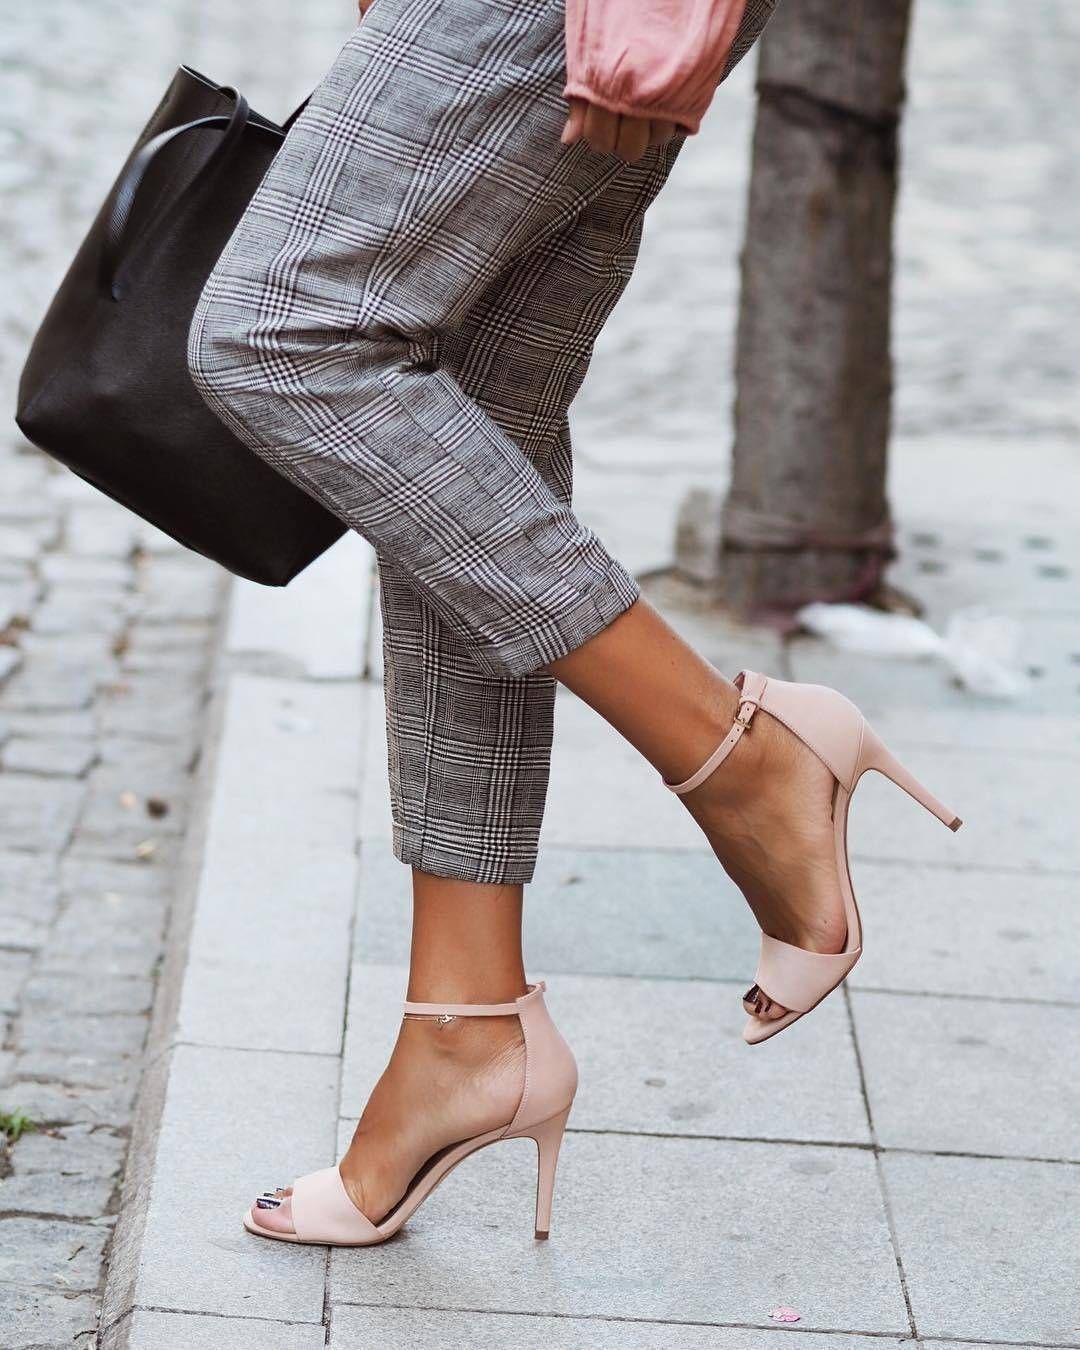 aldo shoes for women instagrams first photo taken